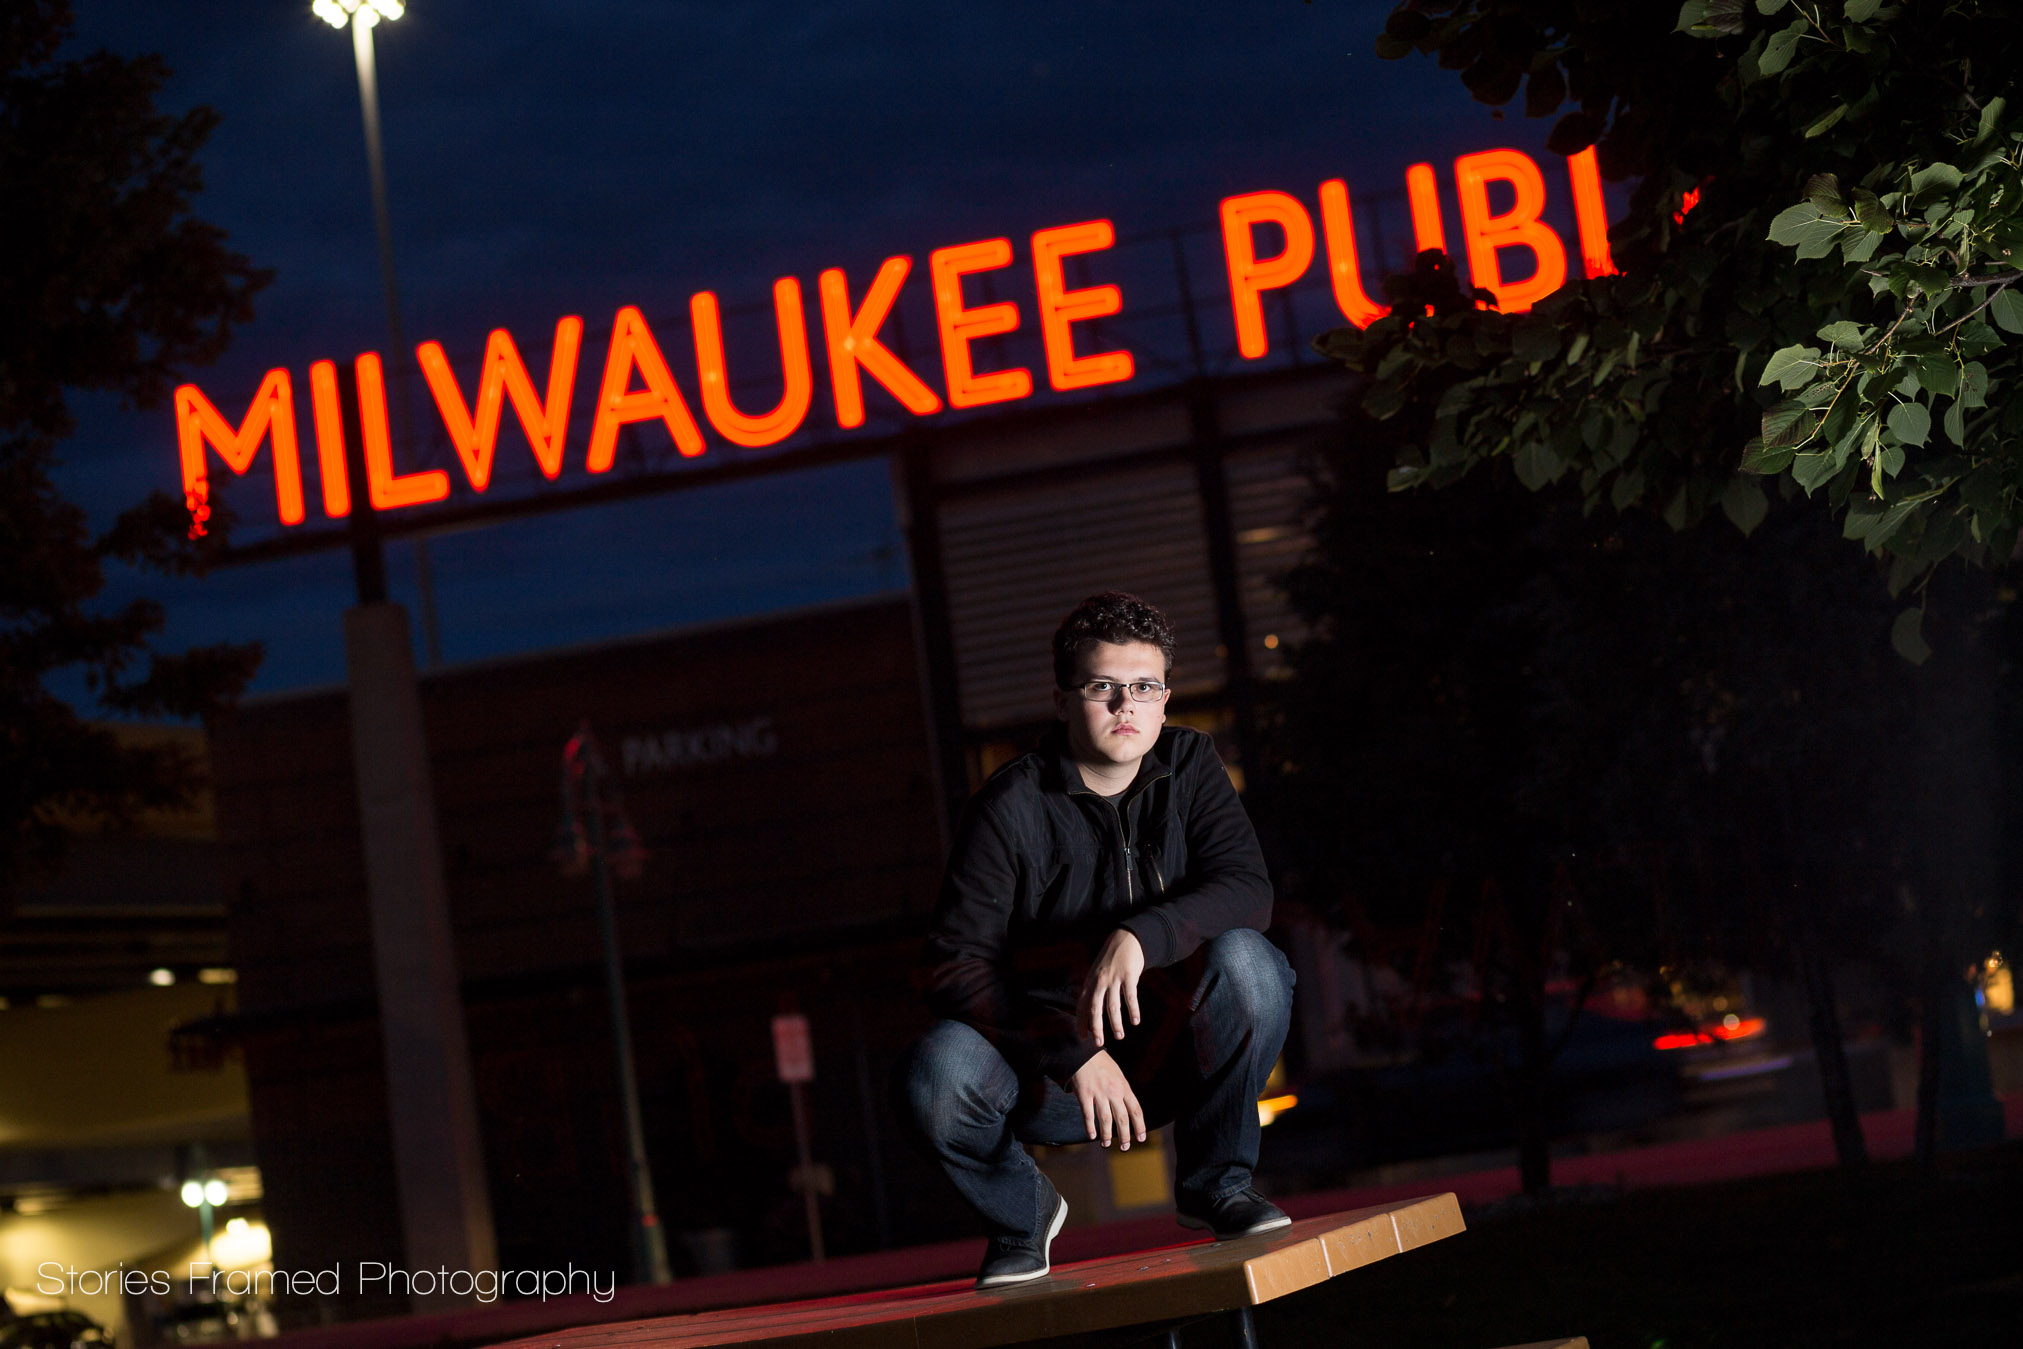 Milwaukee Public Market in senior portrait at night